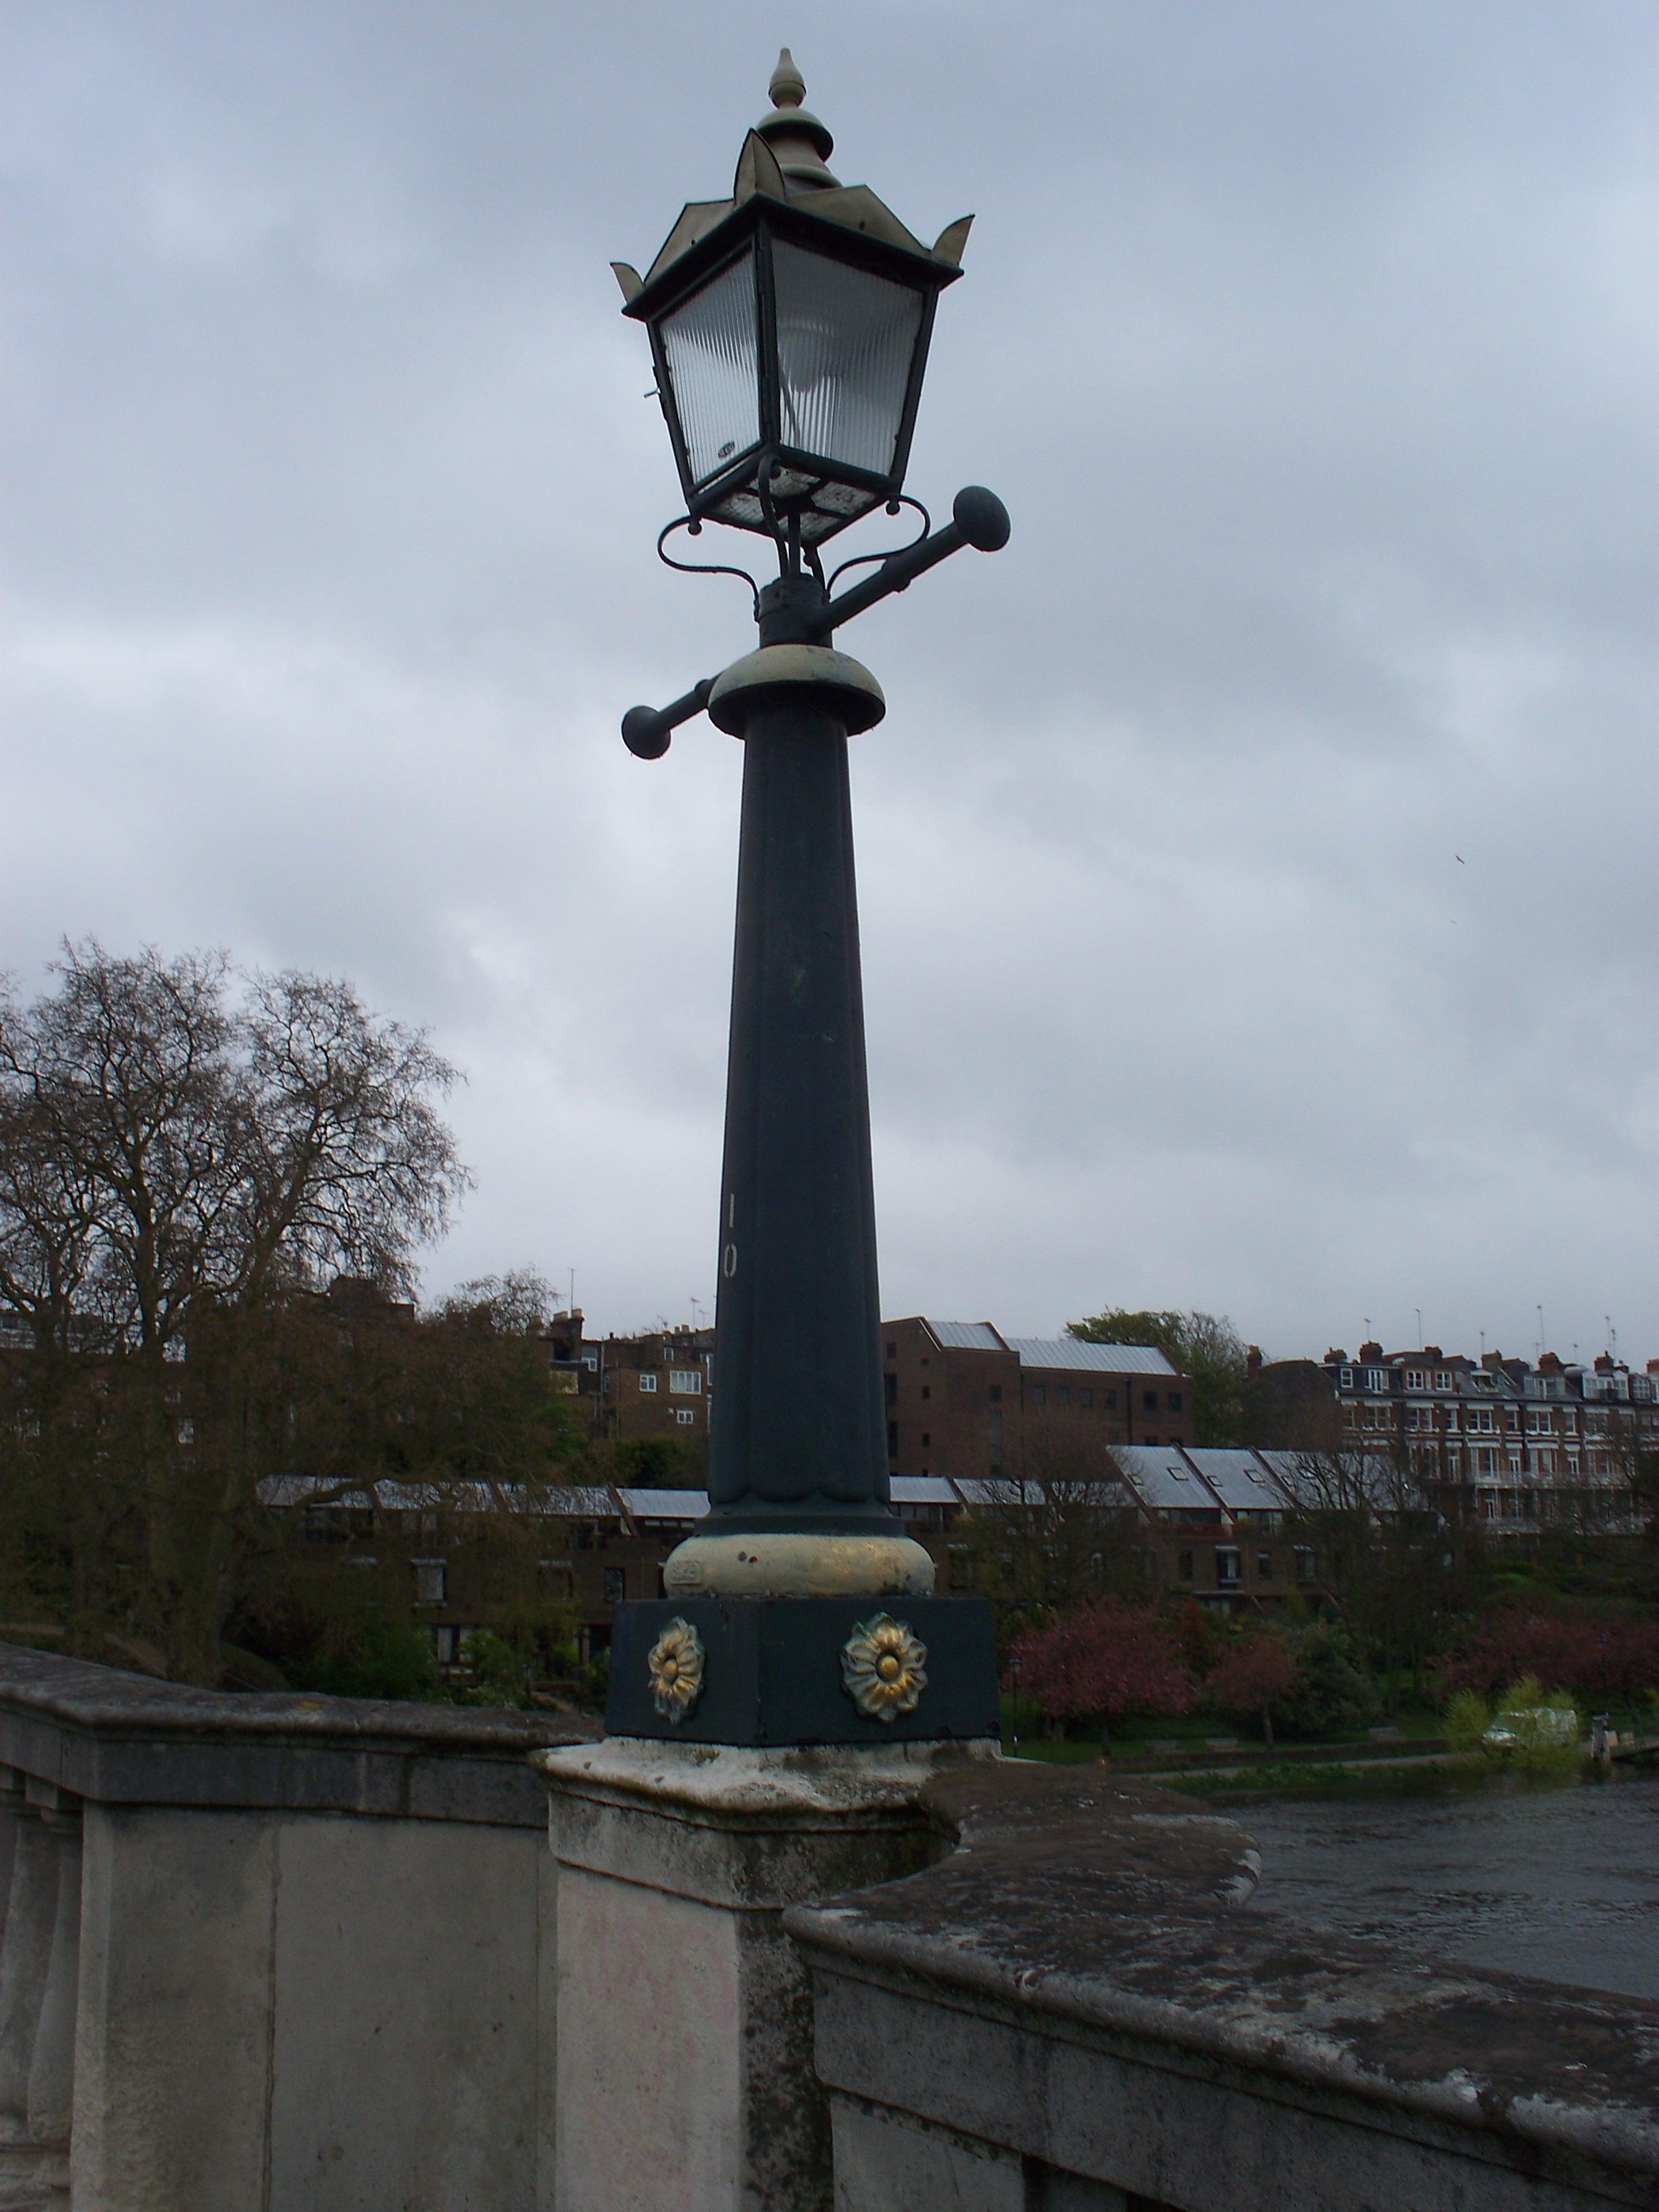 File:Richmond Bridge lamp.JPG - Wikimedia Commons